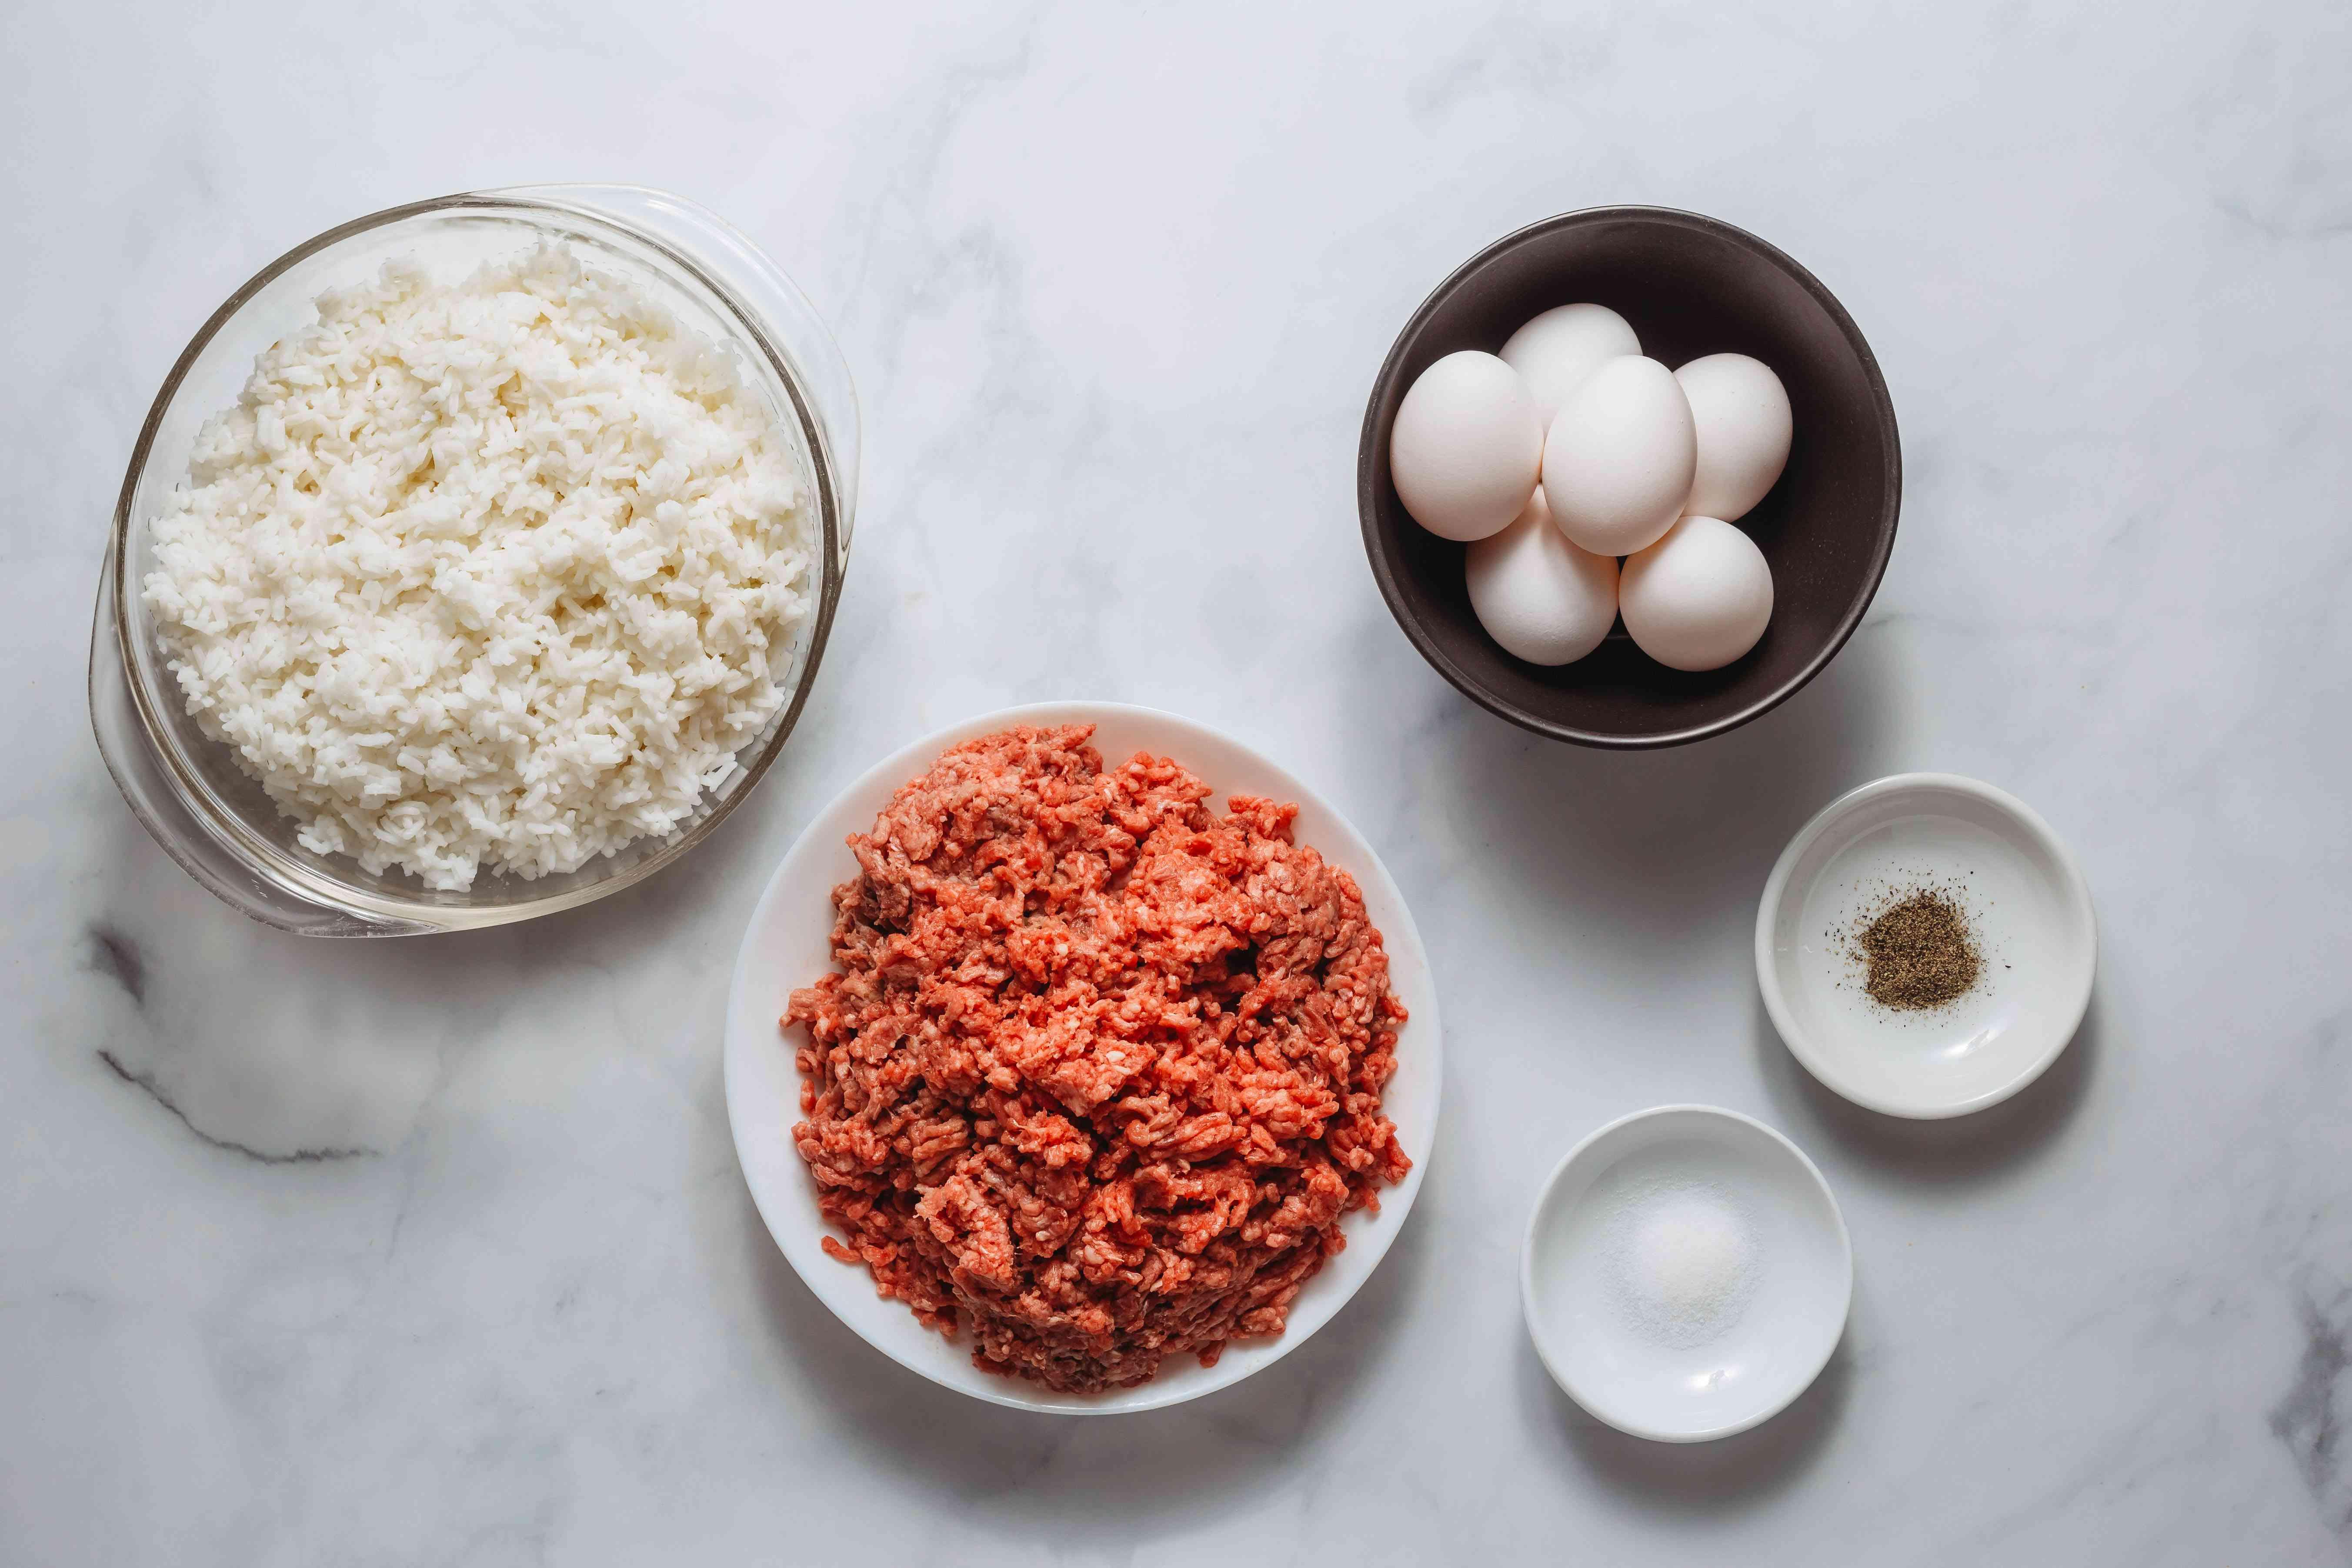 Ingredients for Loco moco burger